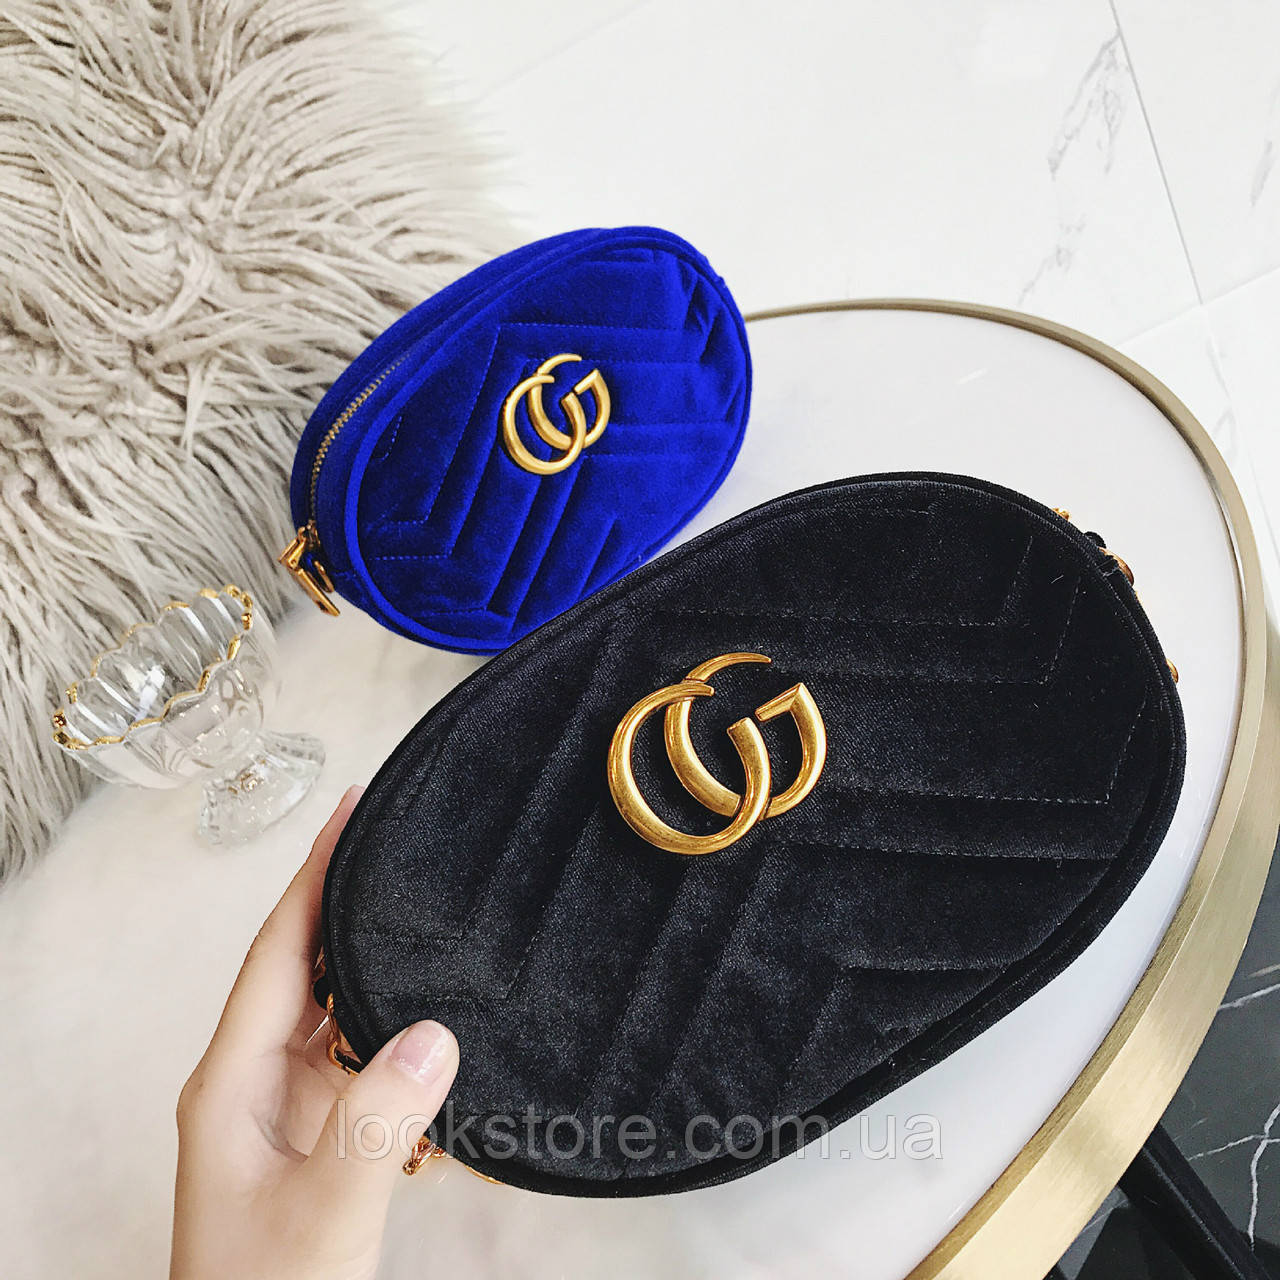 b2555426091f LookStore.com.ua   Женская бархатная поясная сумка на пояс в стиле ...